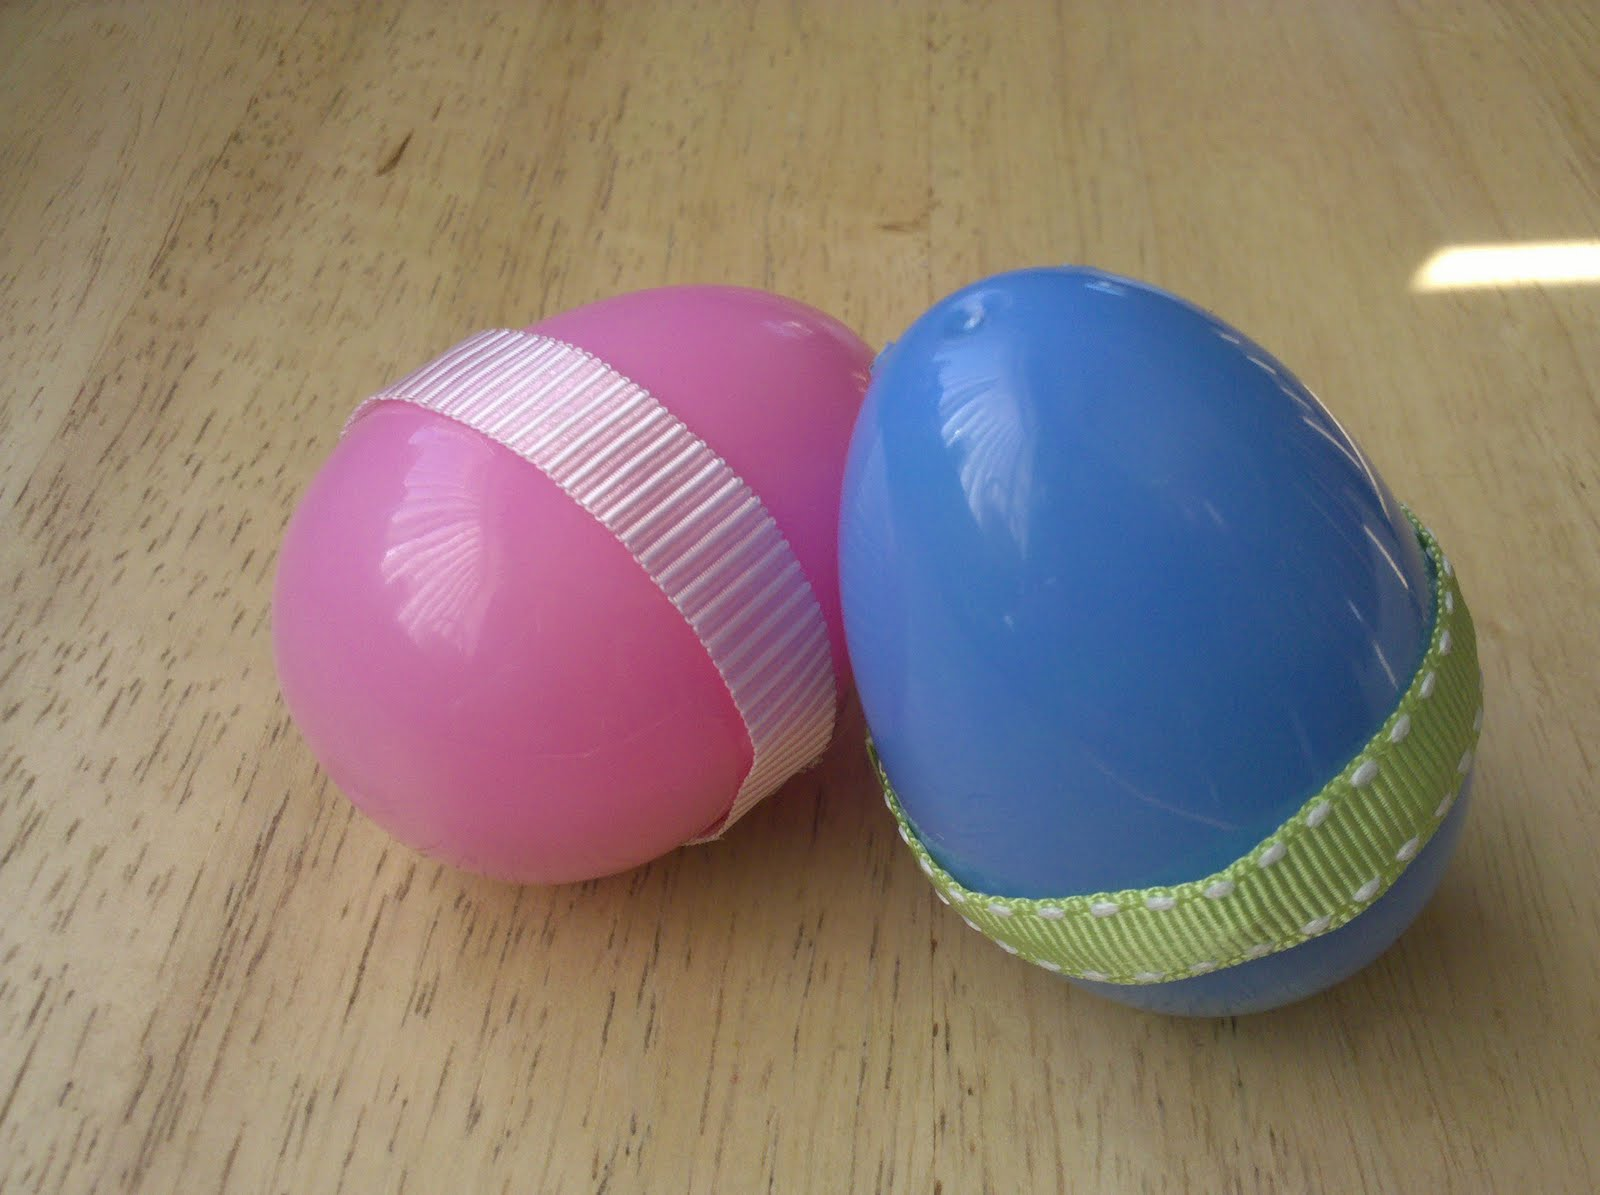 MPL Kids: Parent Tip: Musical Egg Shakers